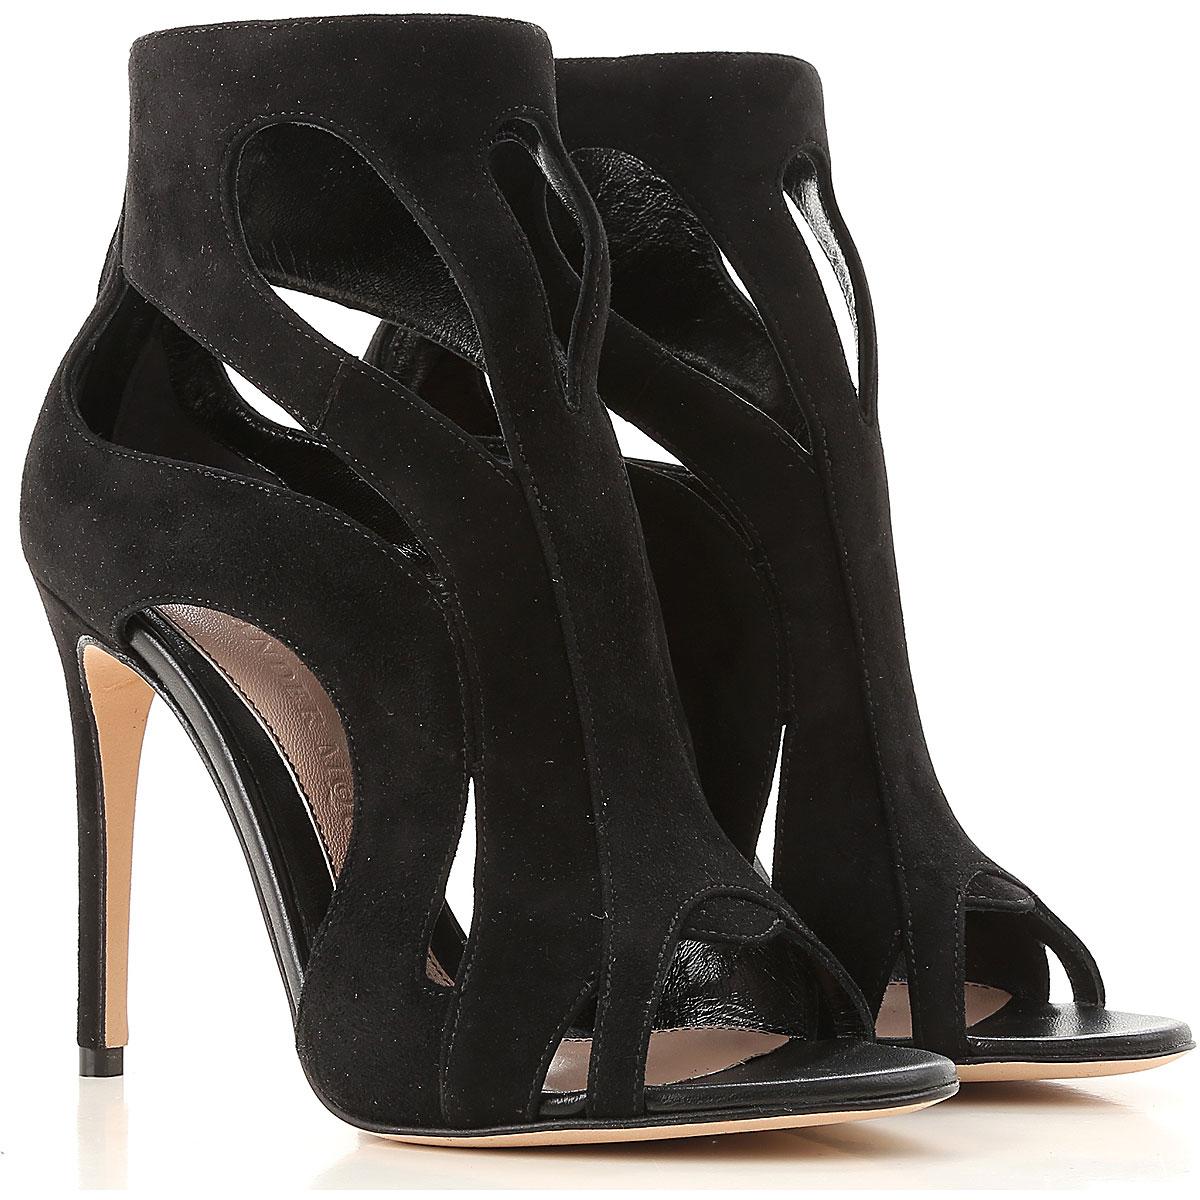 Siyah Sandalet Modelleri 2019